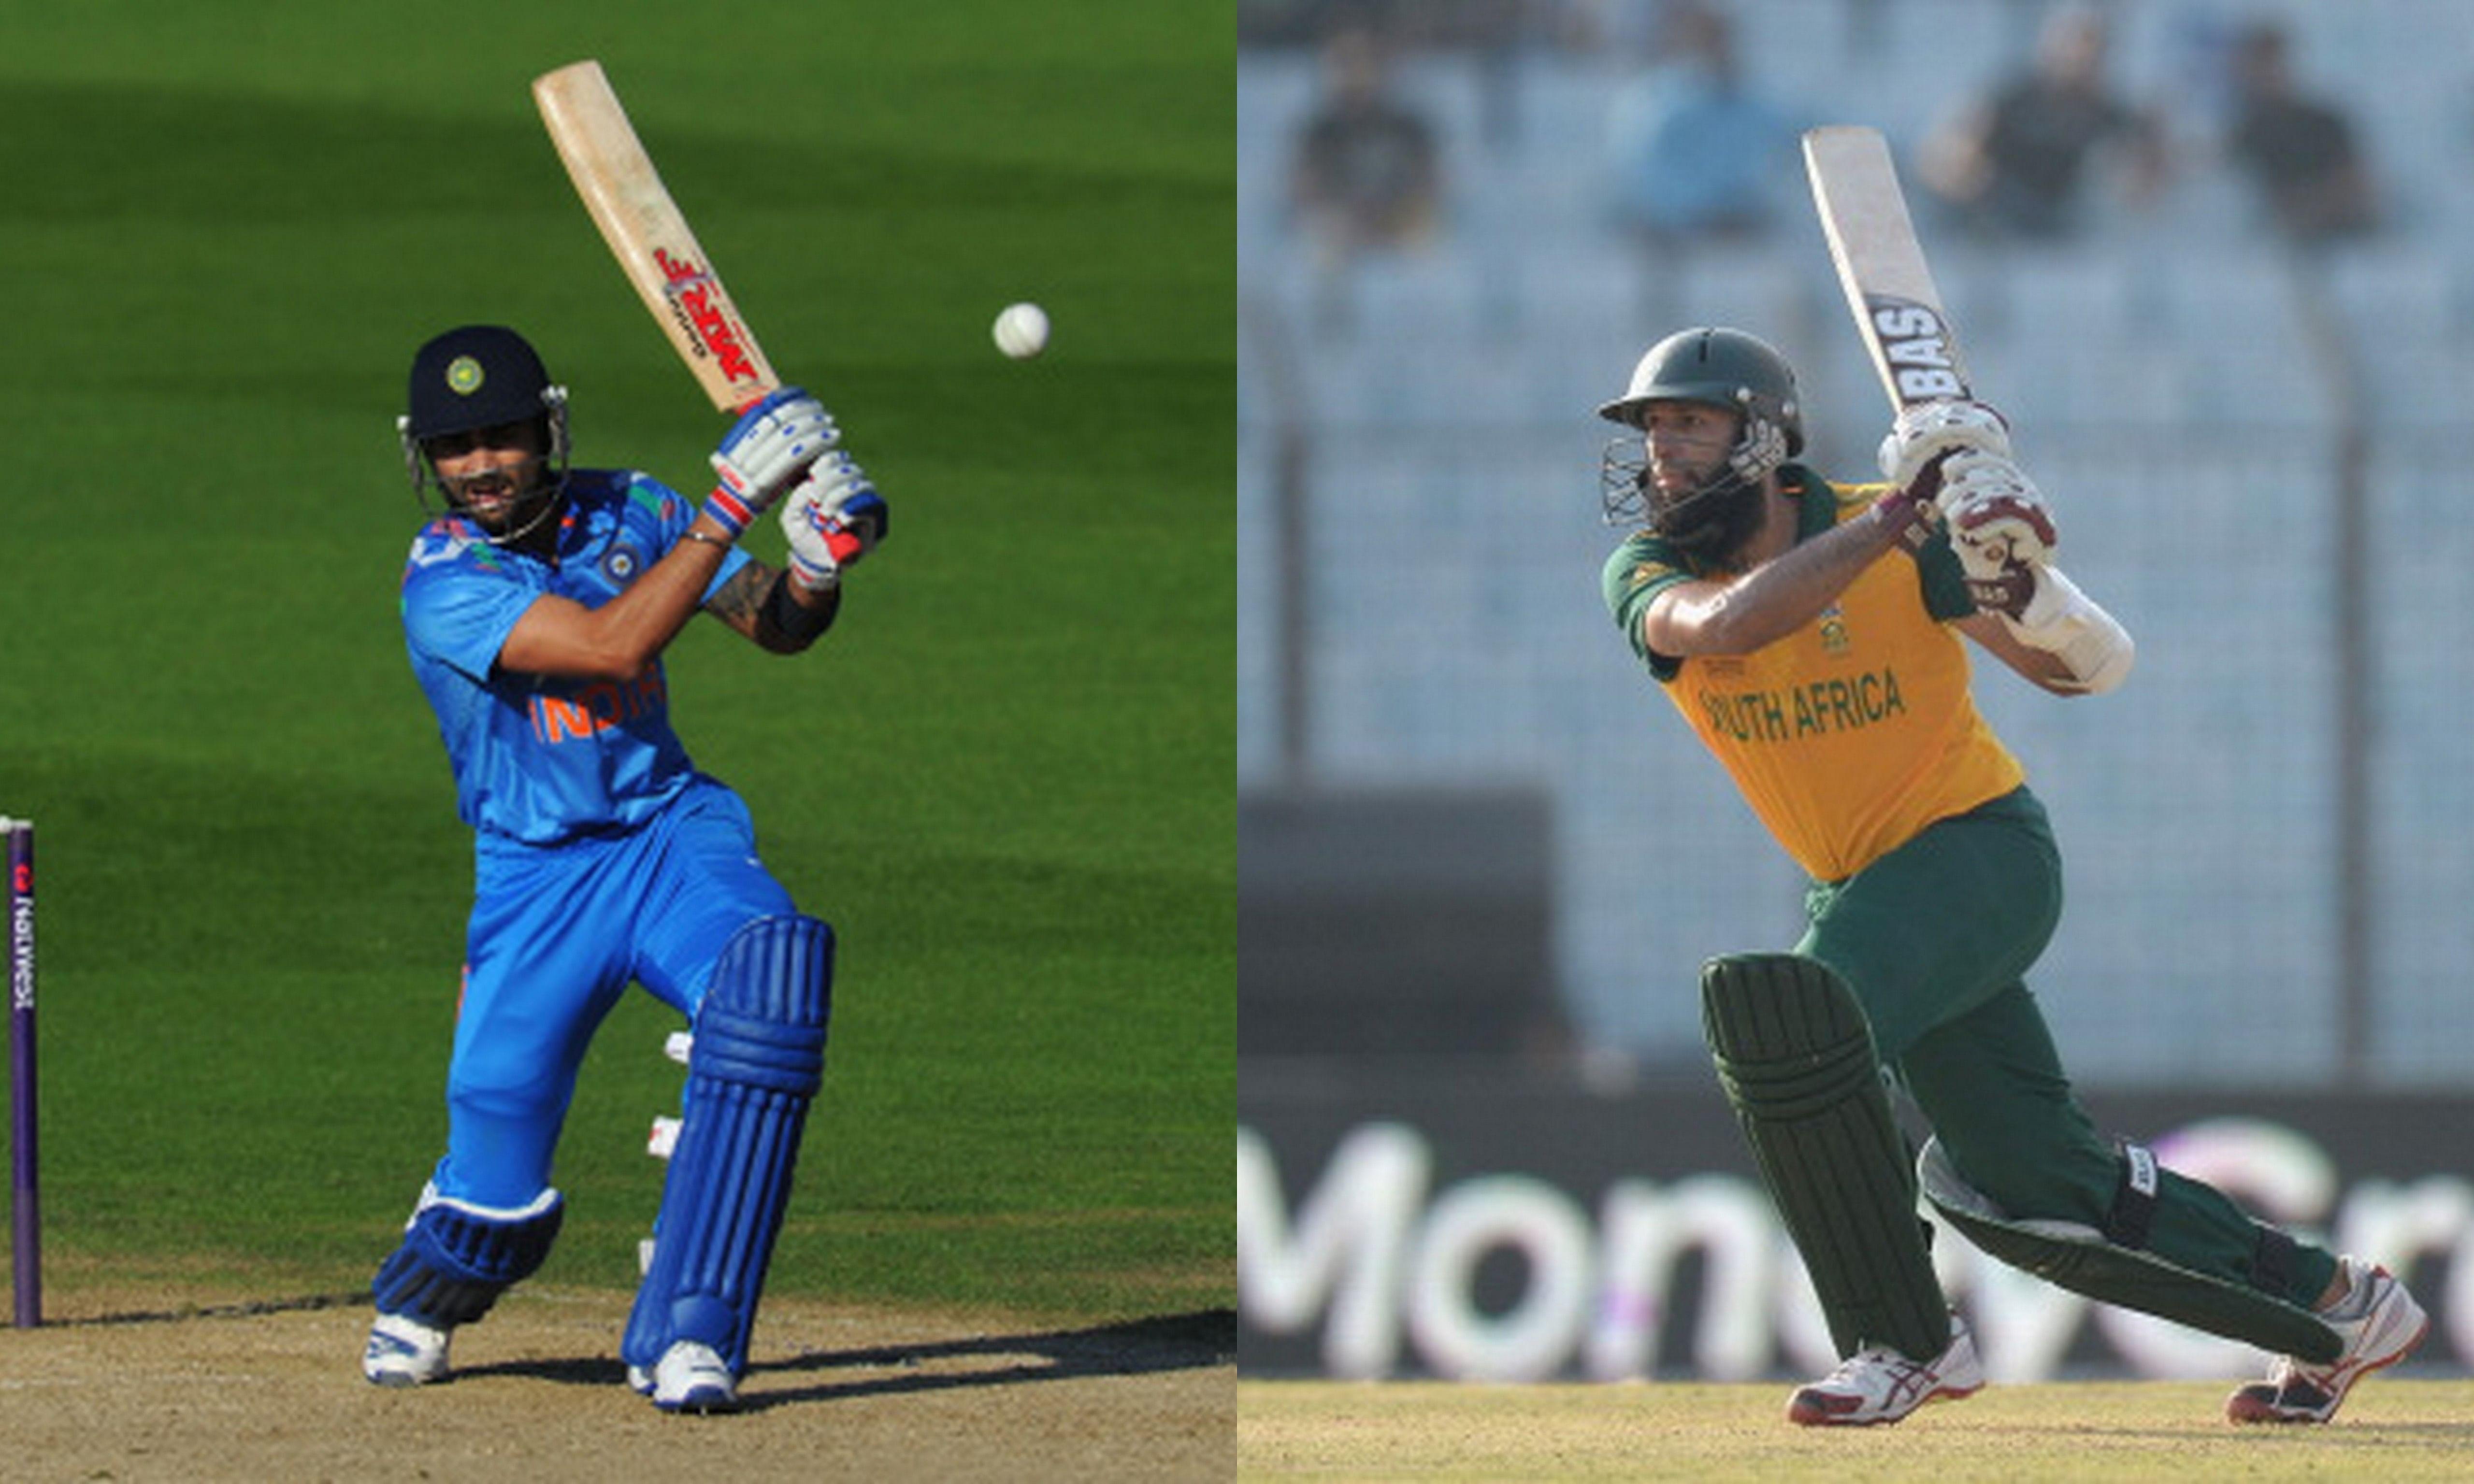 Statistical comparison - ODIs: Virat Kohli vs Hashim Amla